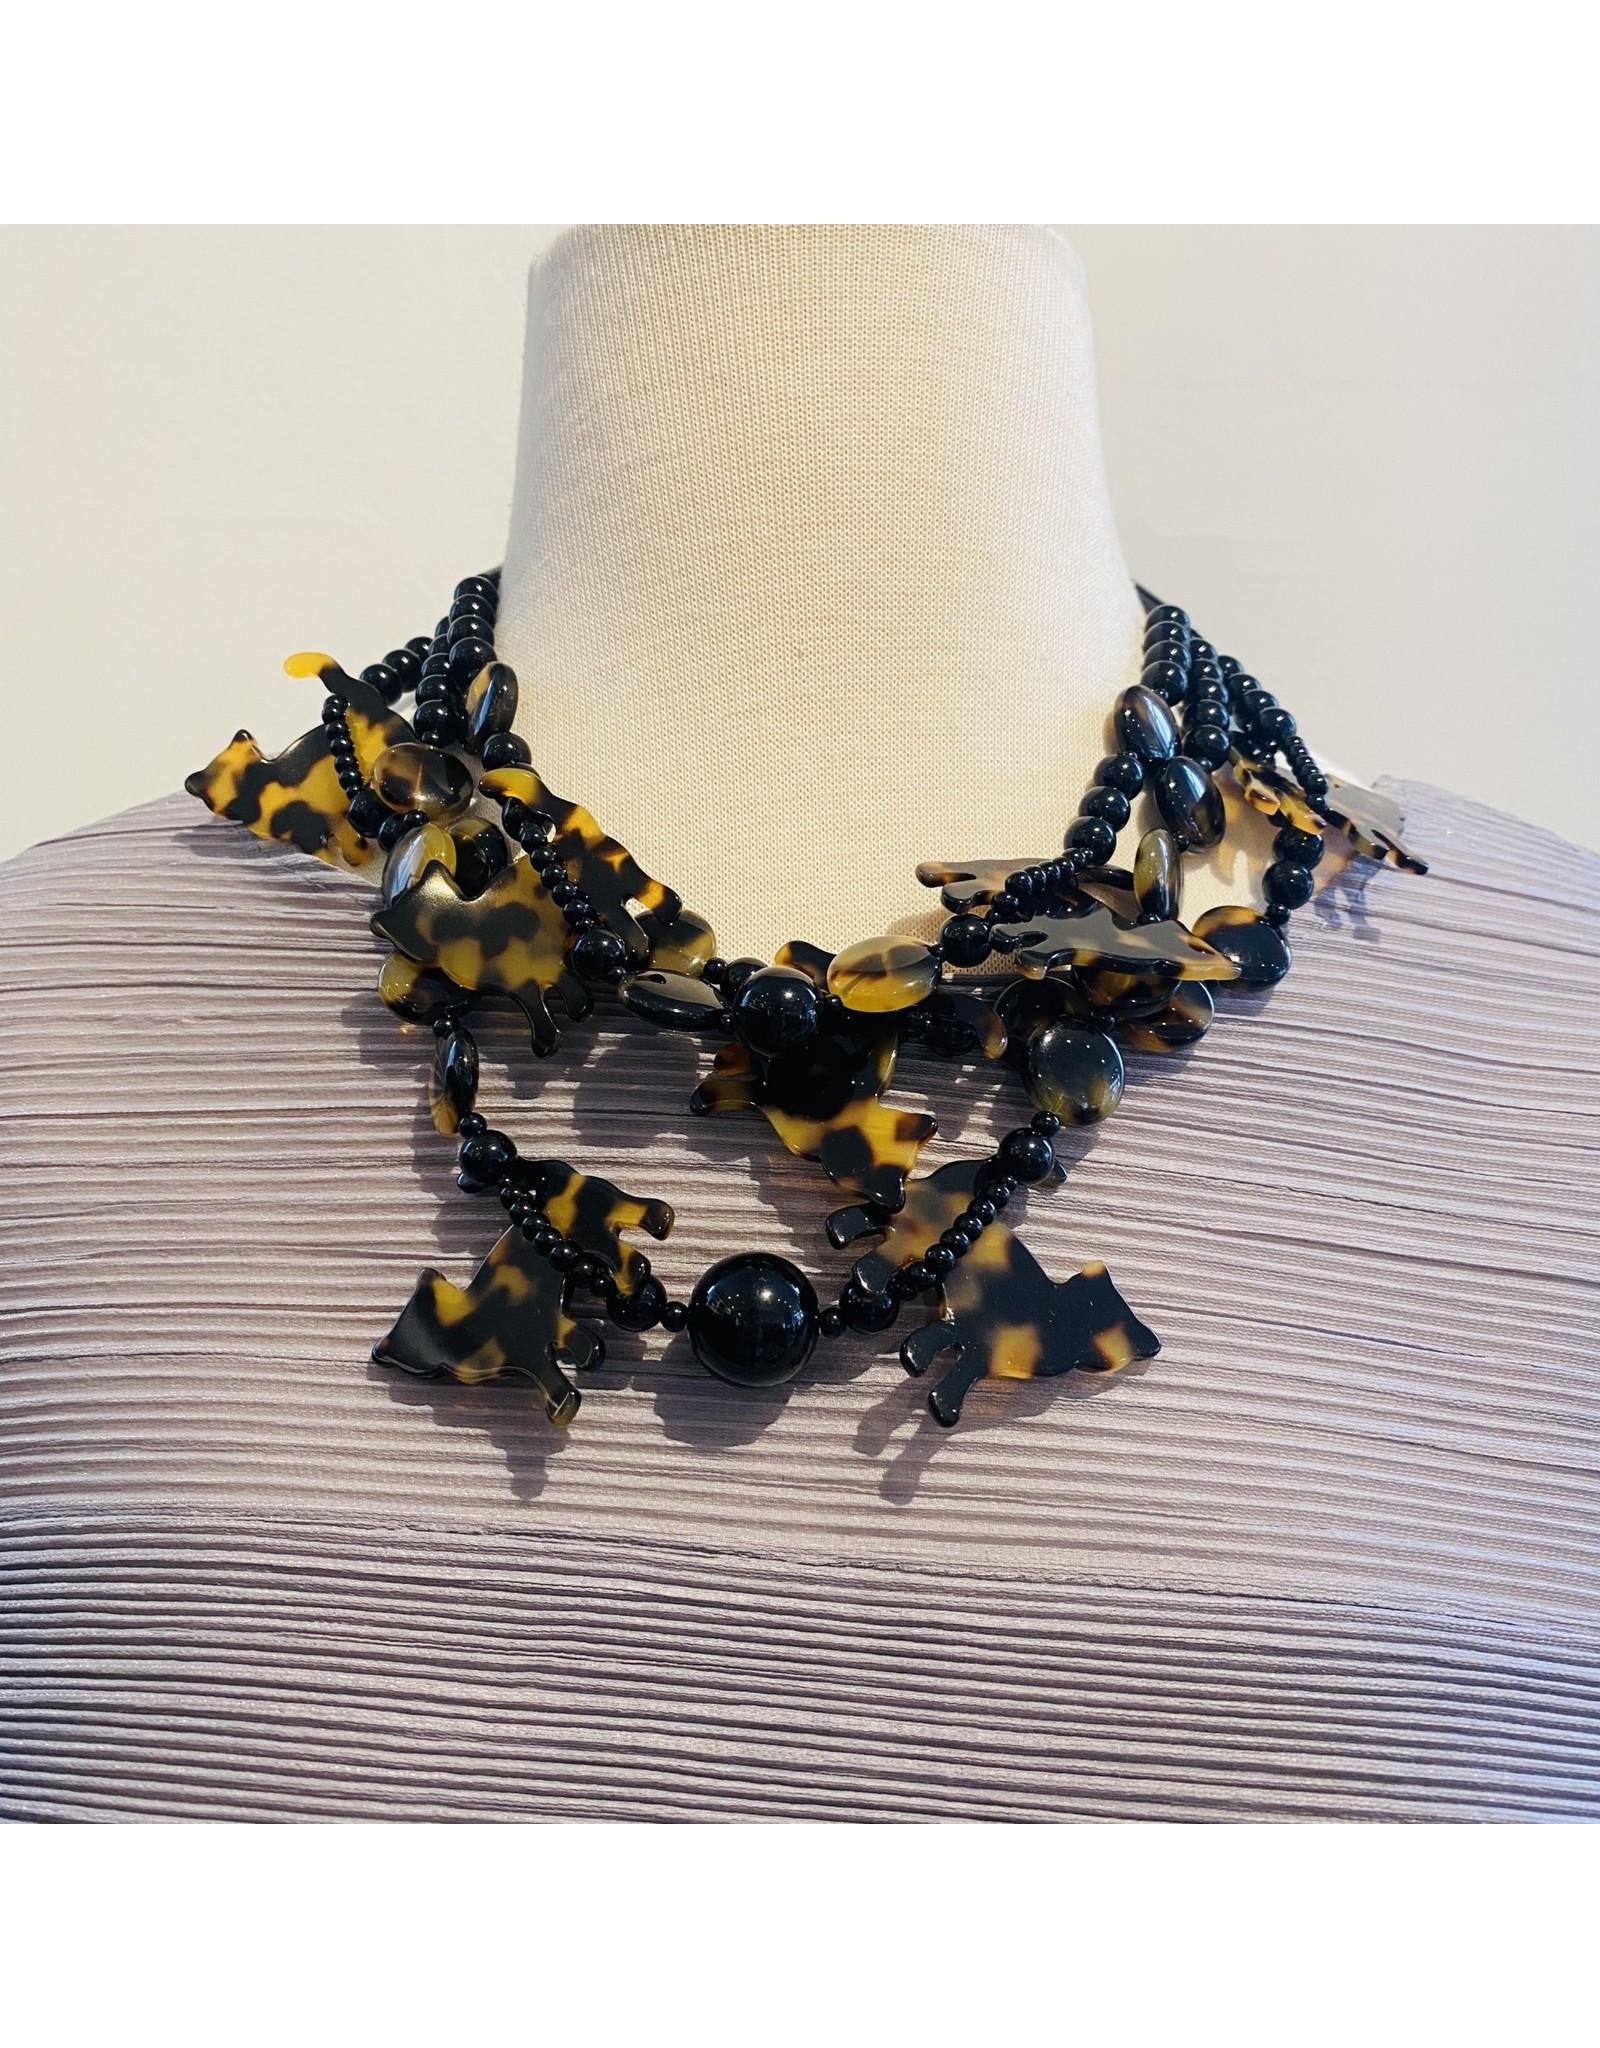 Angela Caputi 3 Strands: Tortoiseshell Cats Necklace